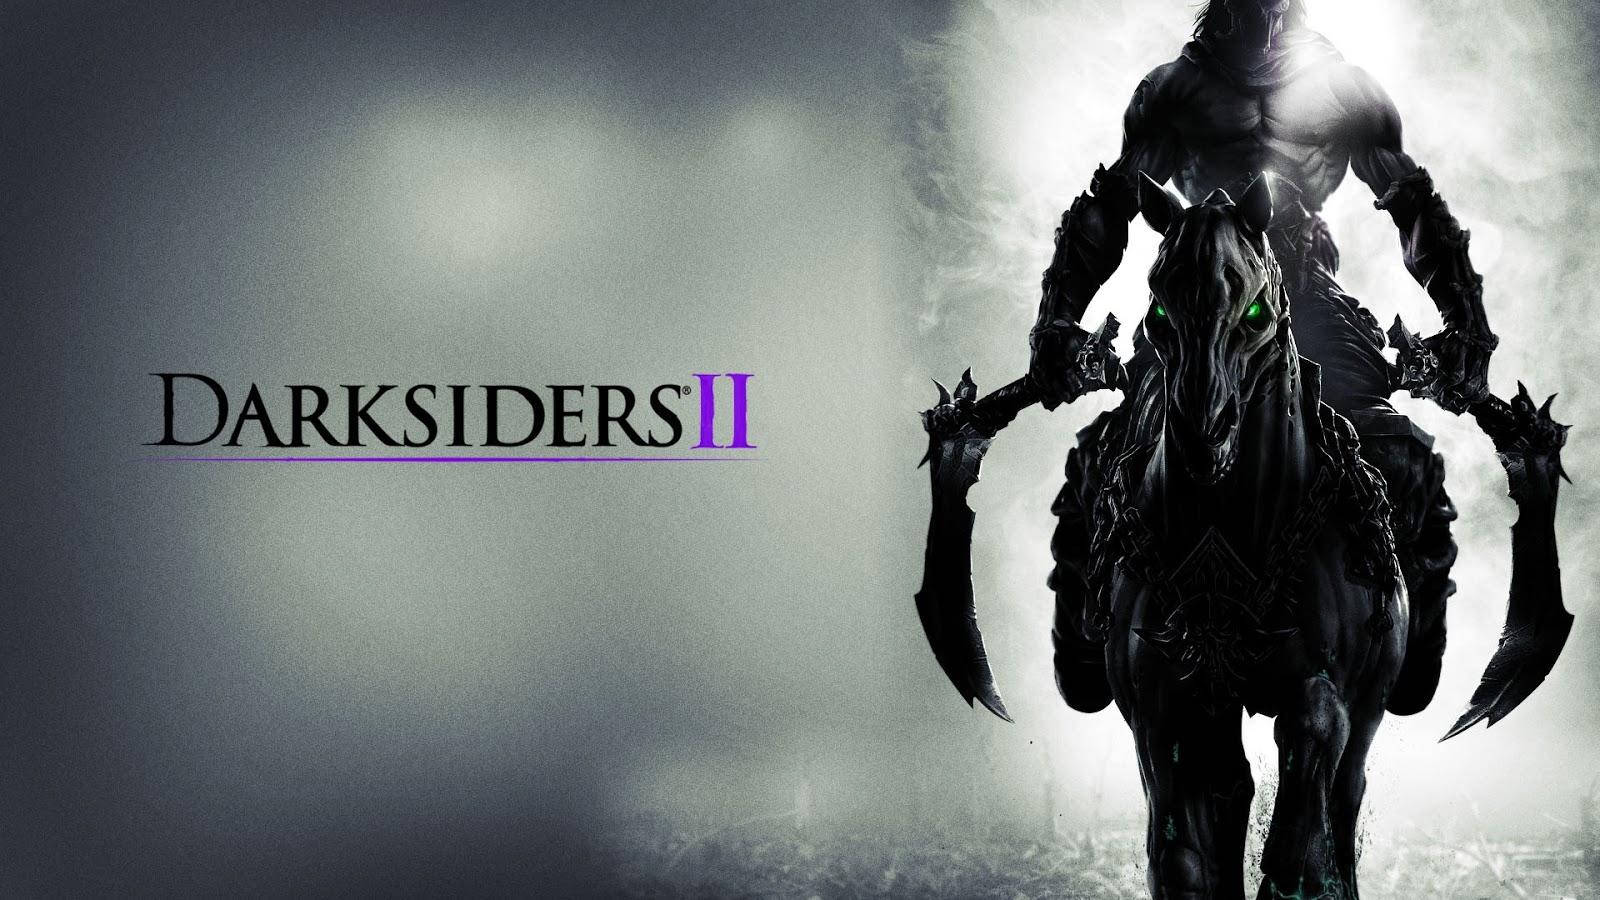 Darksiders 2 Game Wallpaper